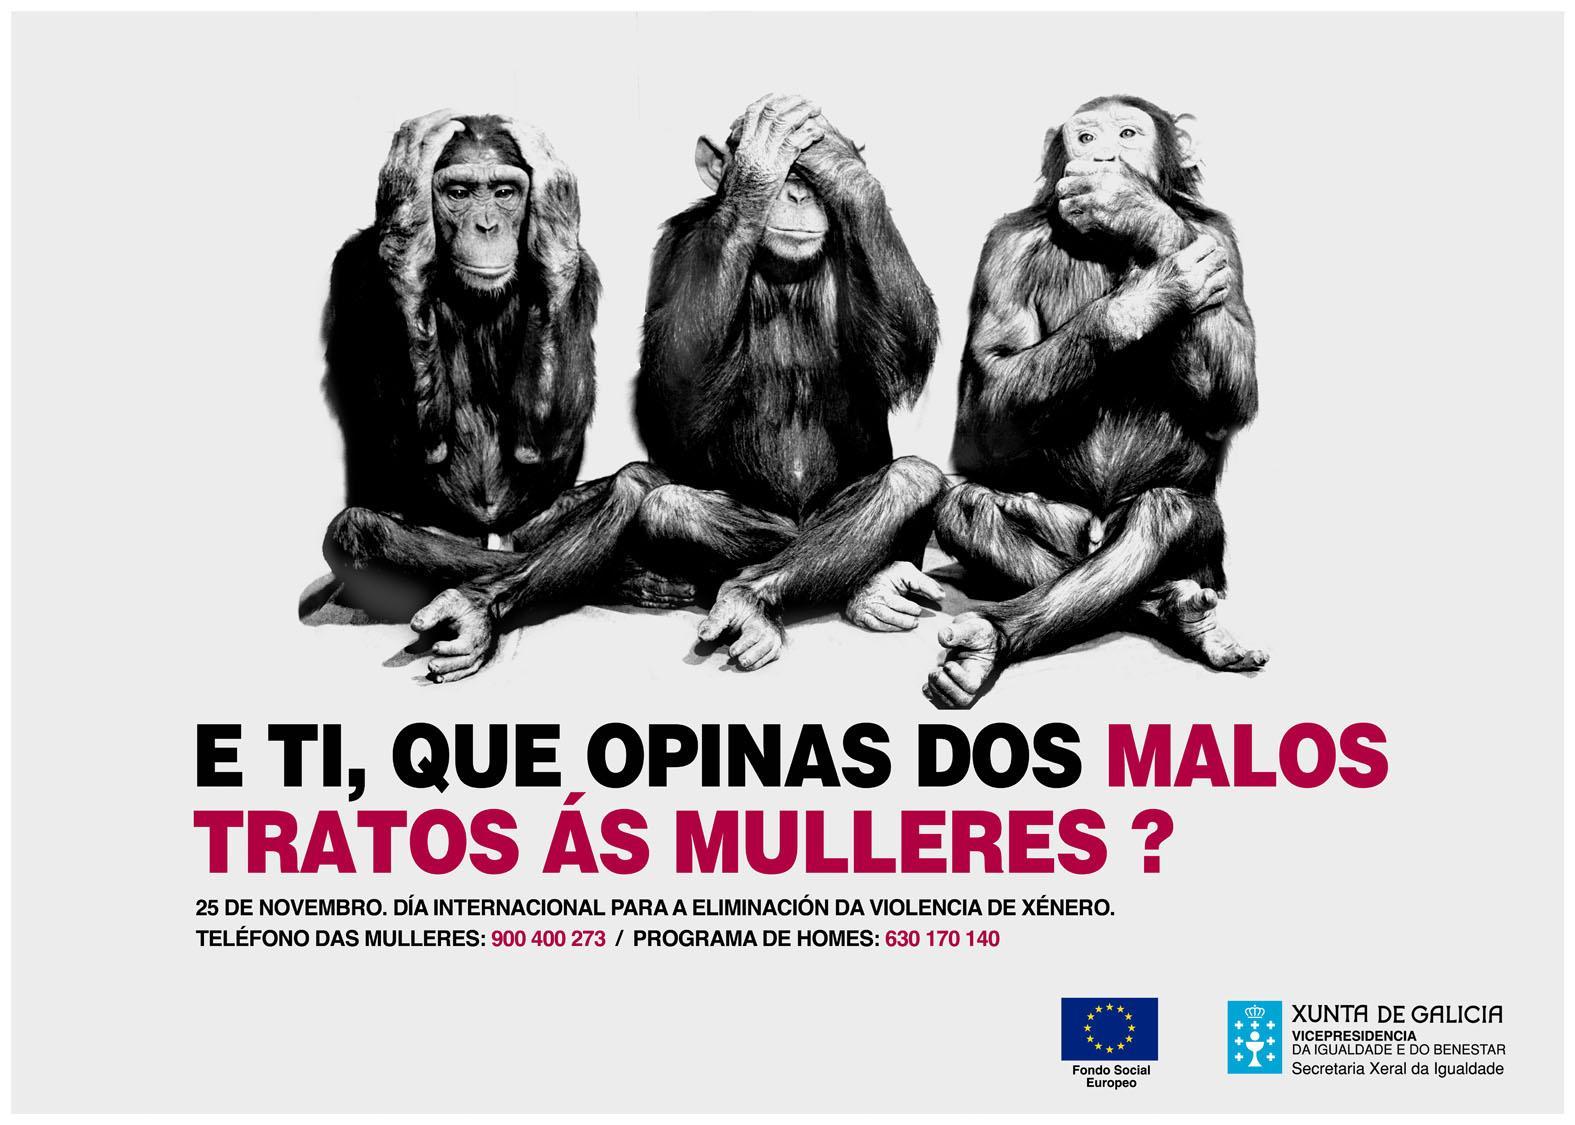 Campaña Contra Malos Tratos Mulleres 25N